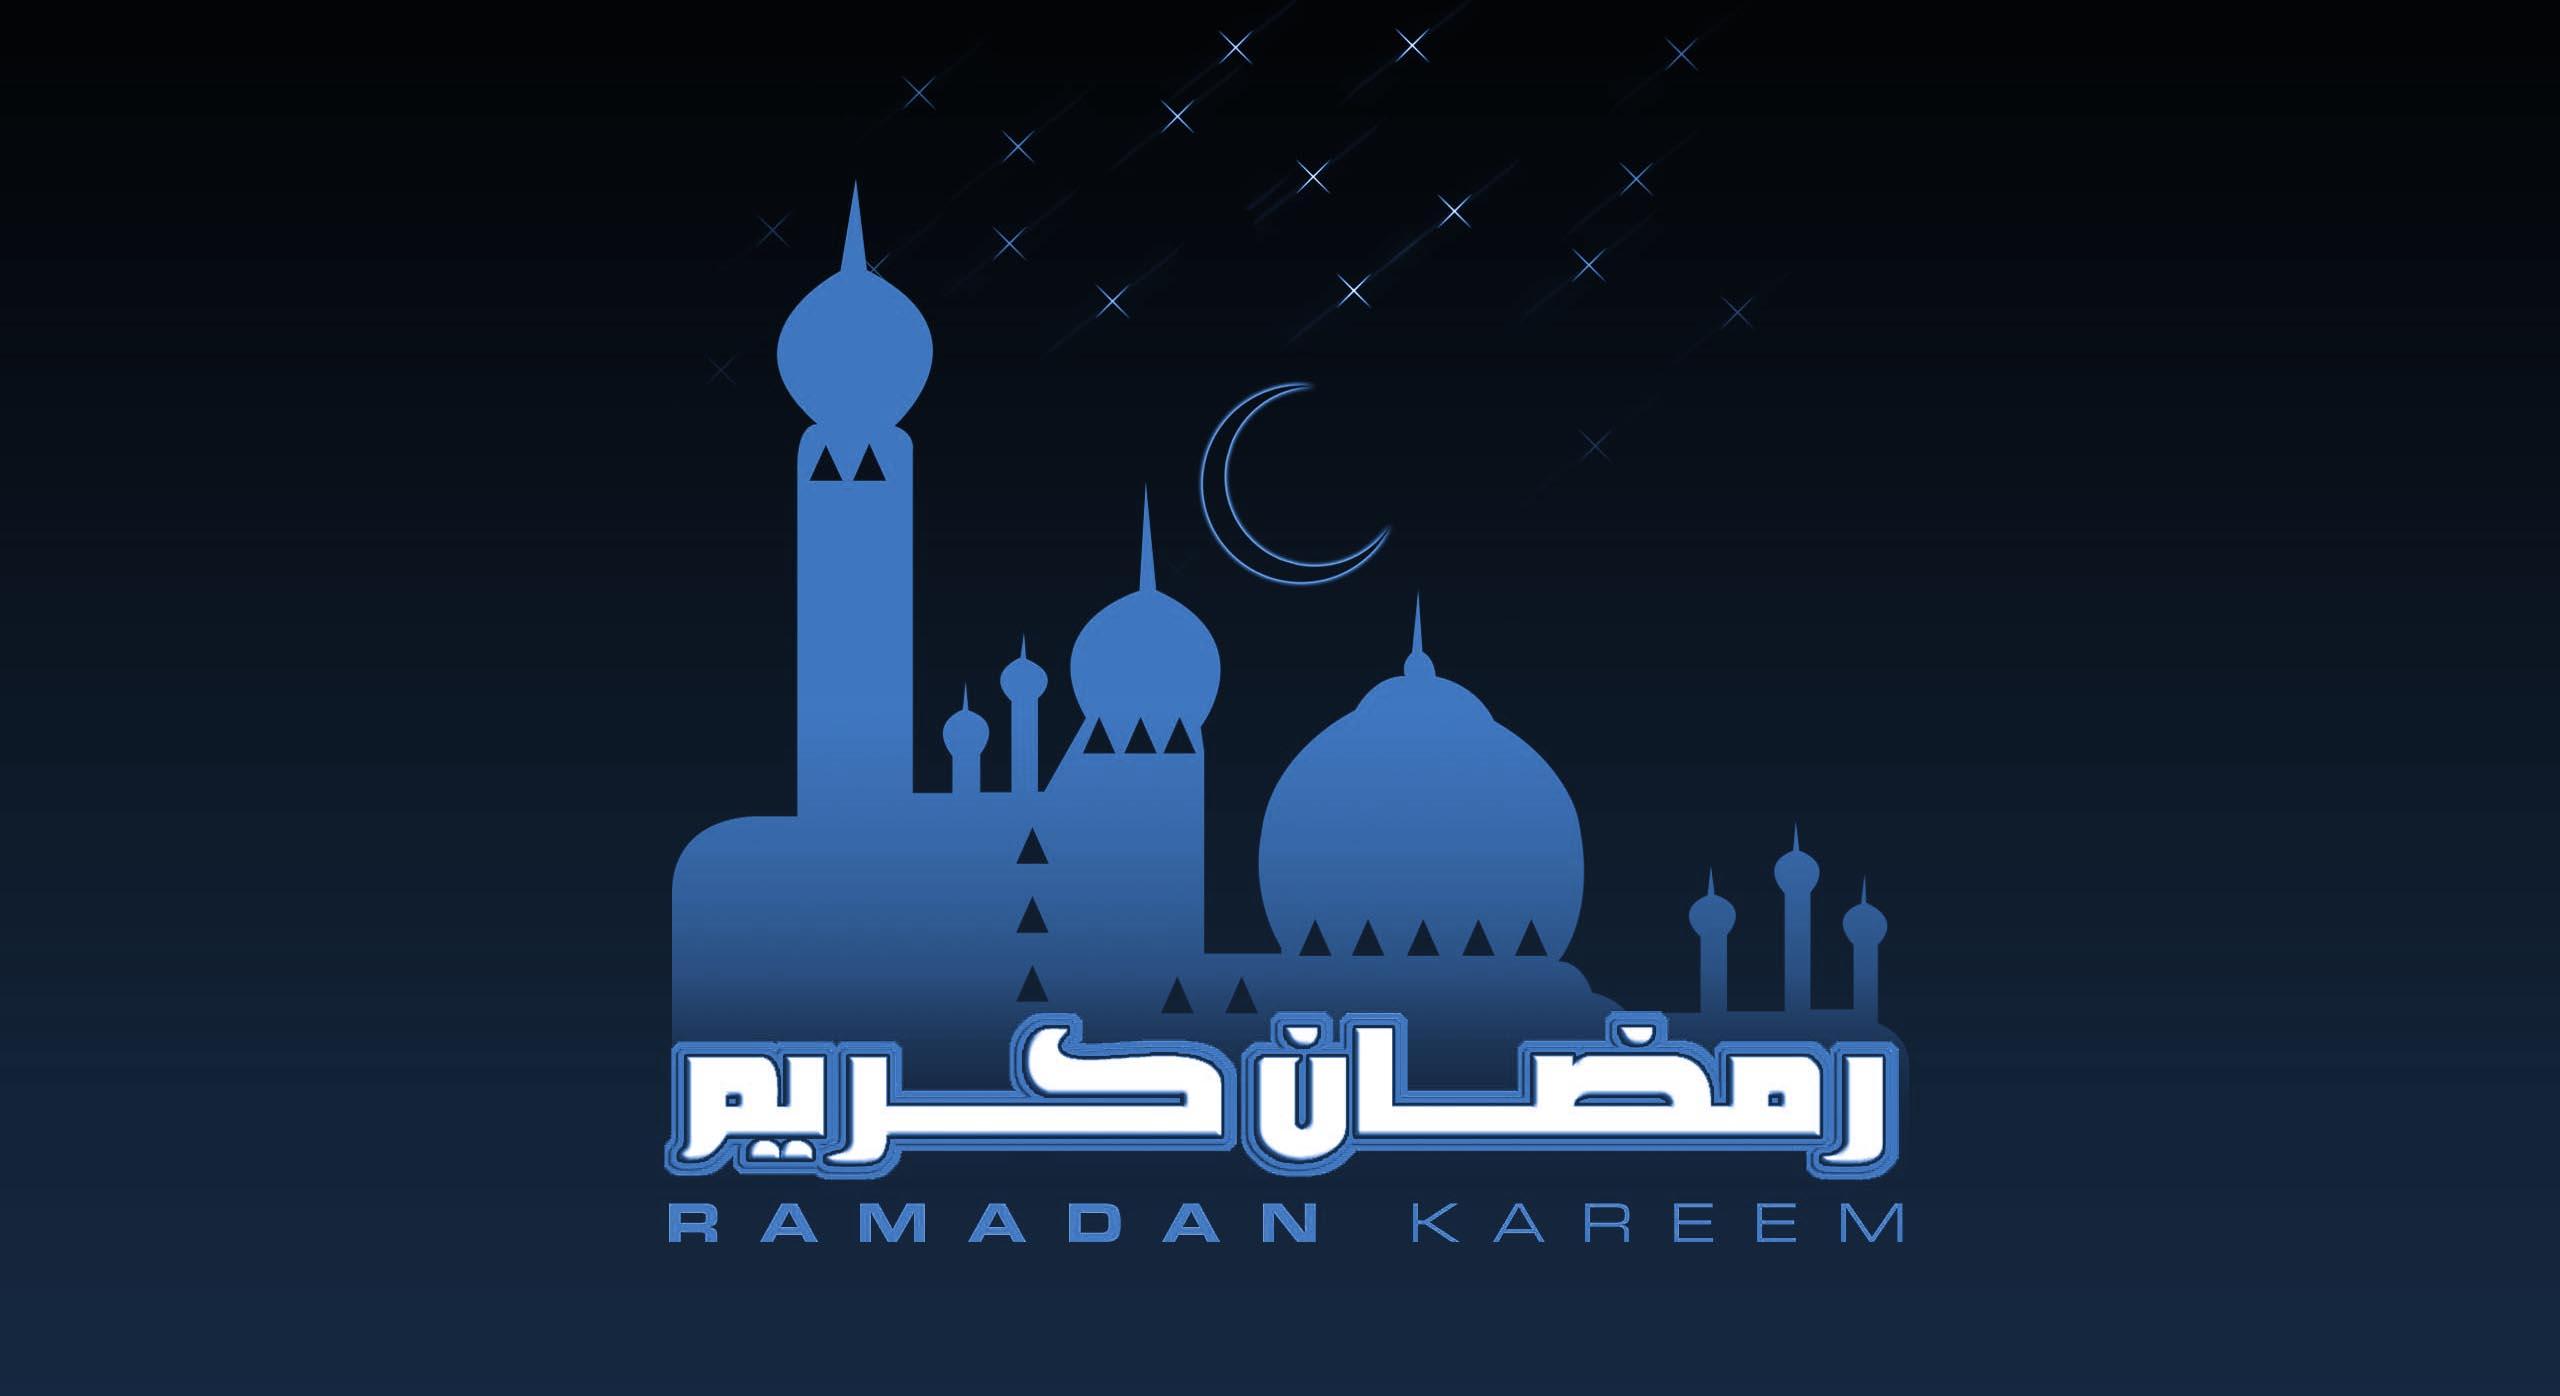 Niat puasa ramadhan dan artinya